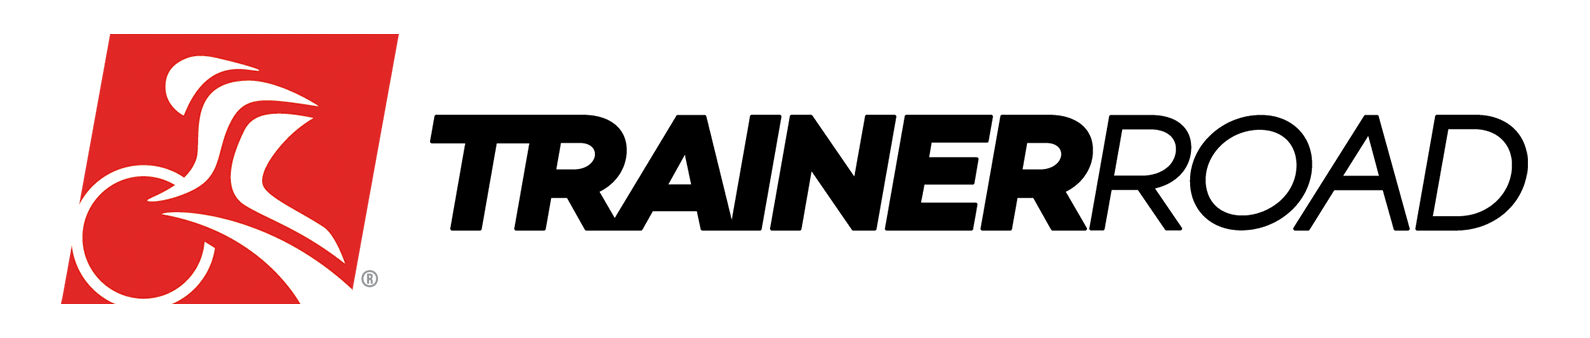 trainer road logo